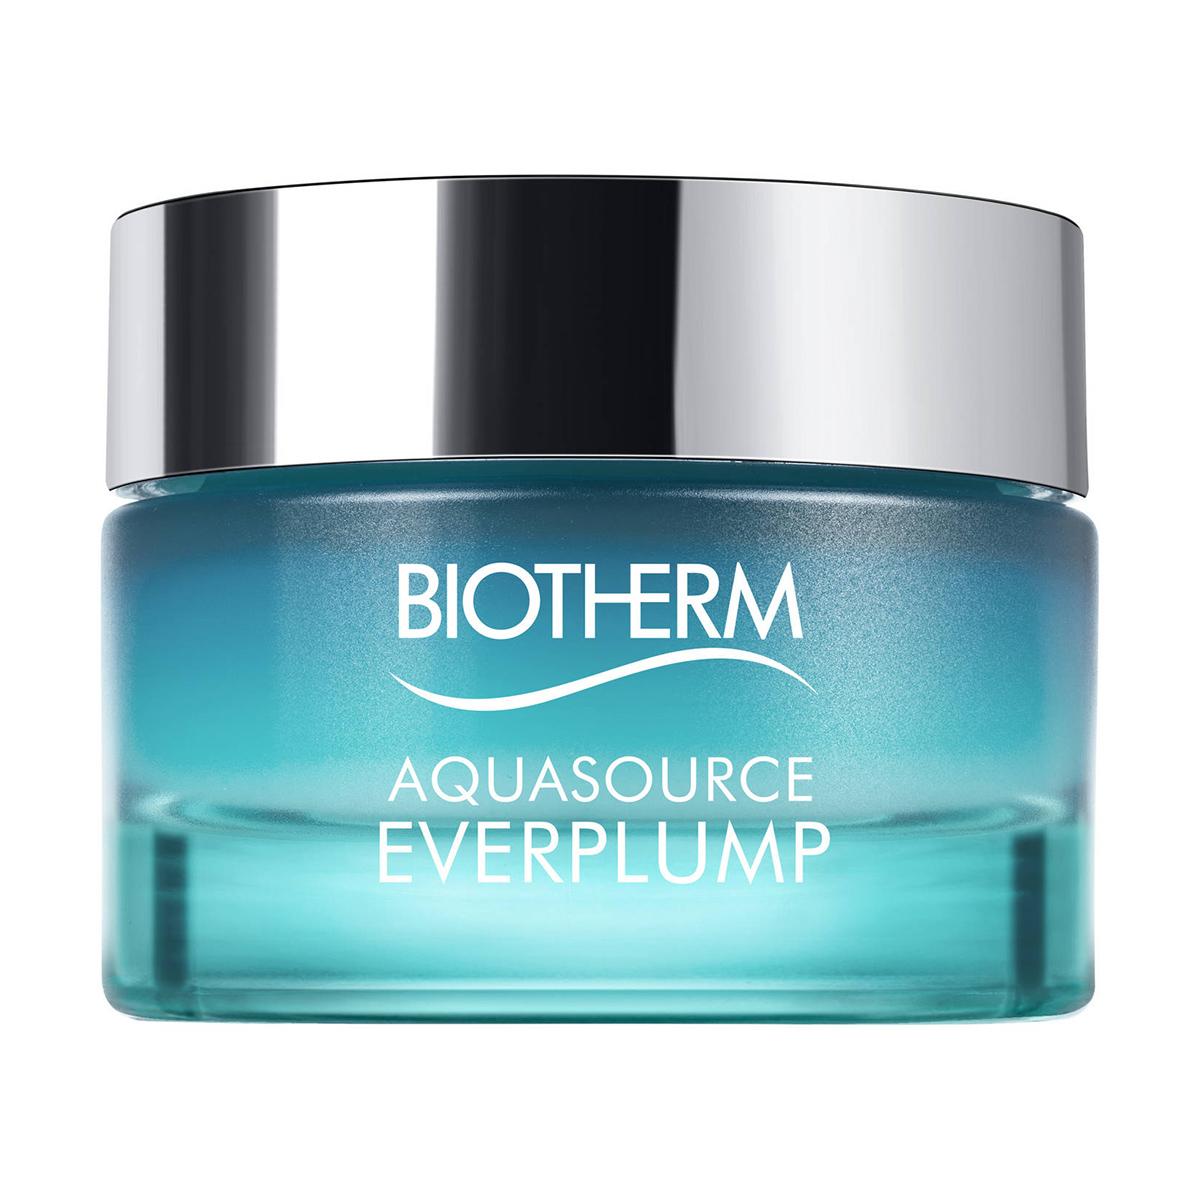 Biotherm - Aquasource Everplump - 50 ml